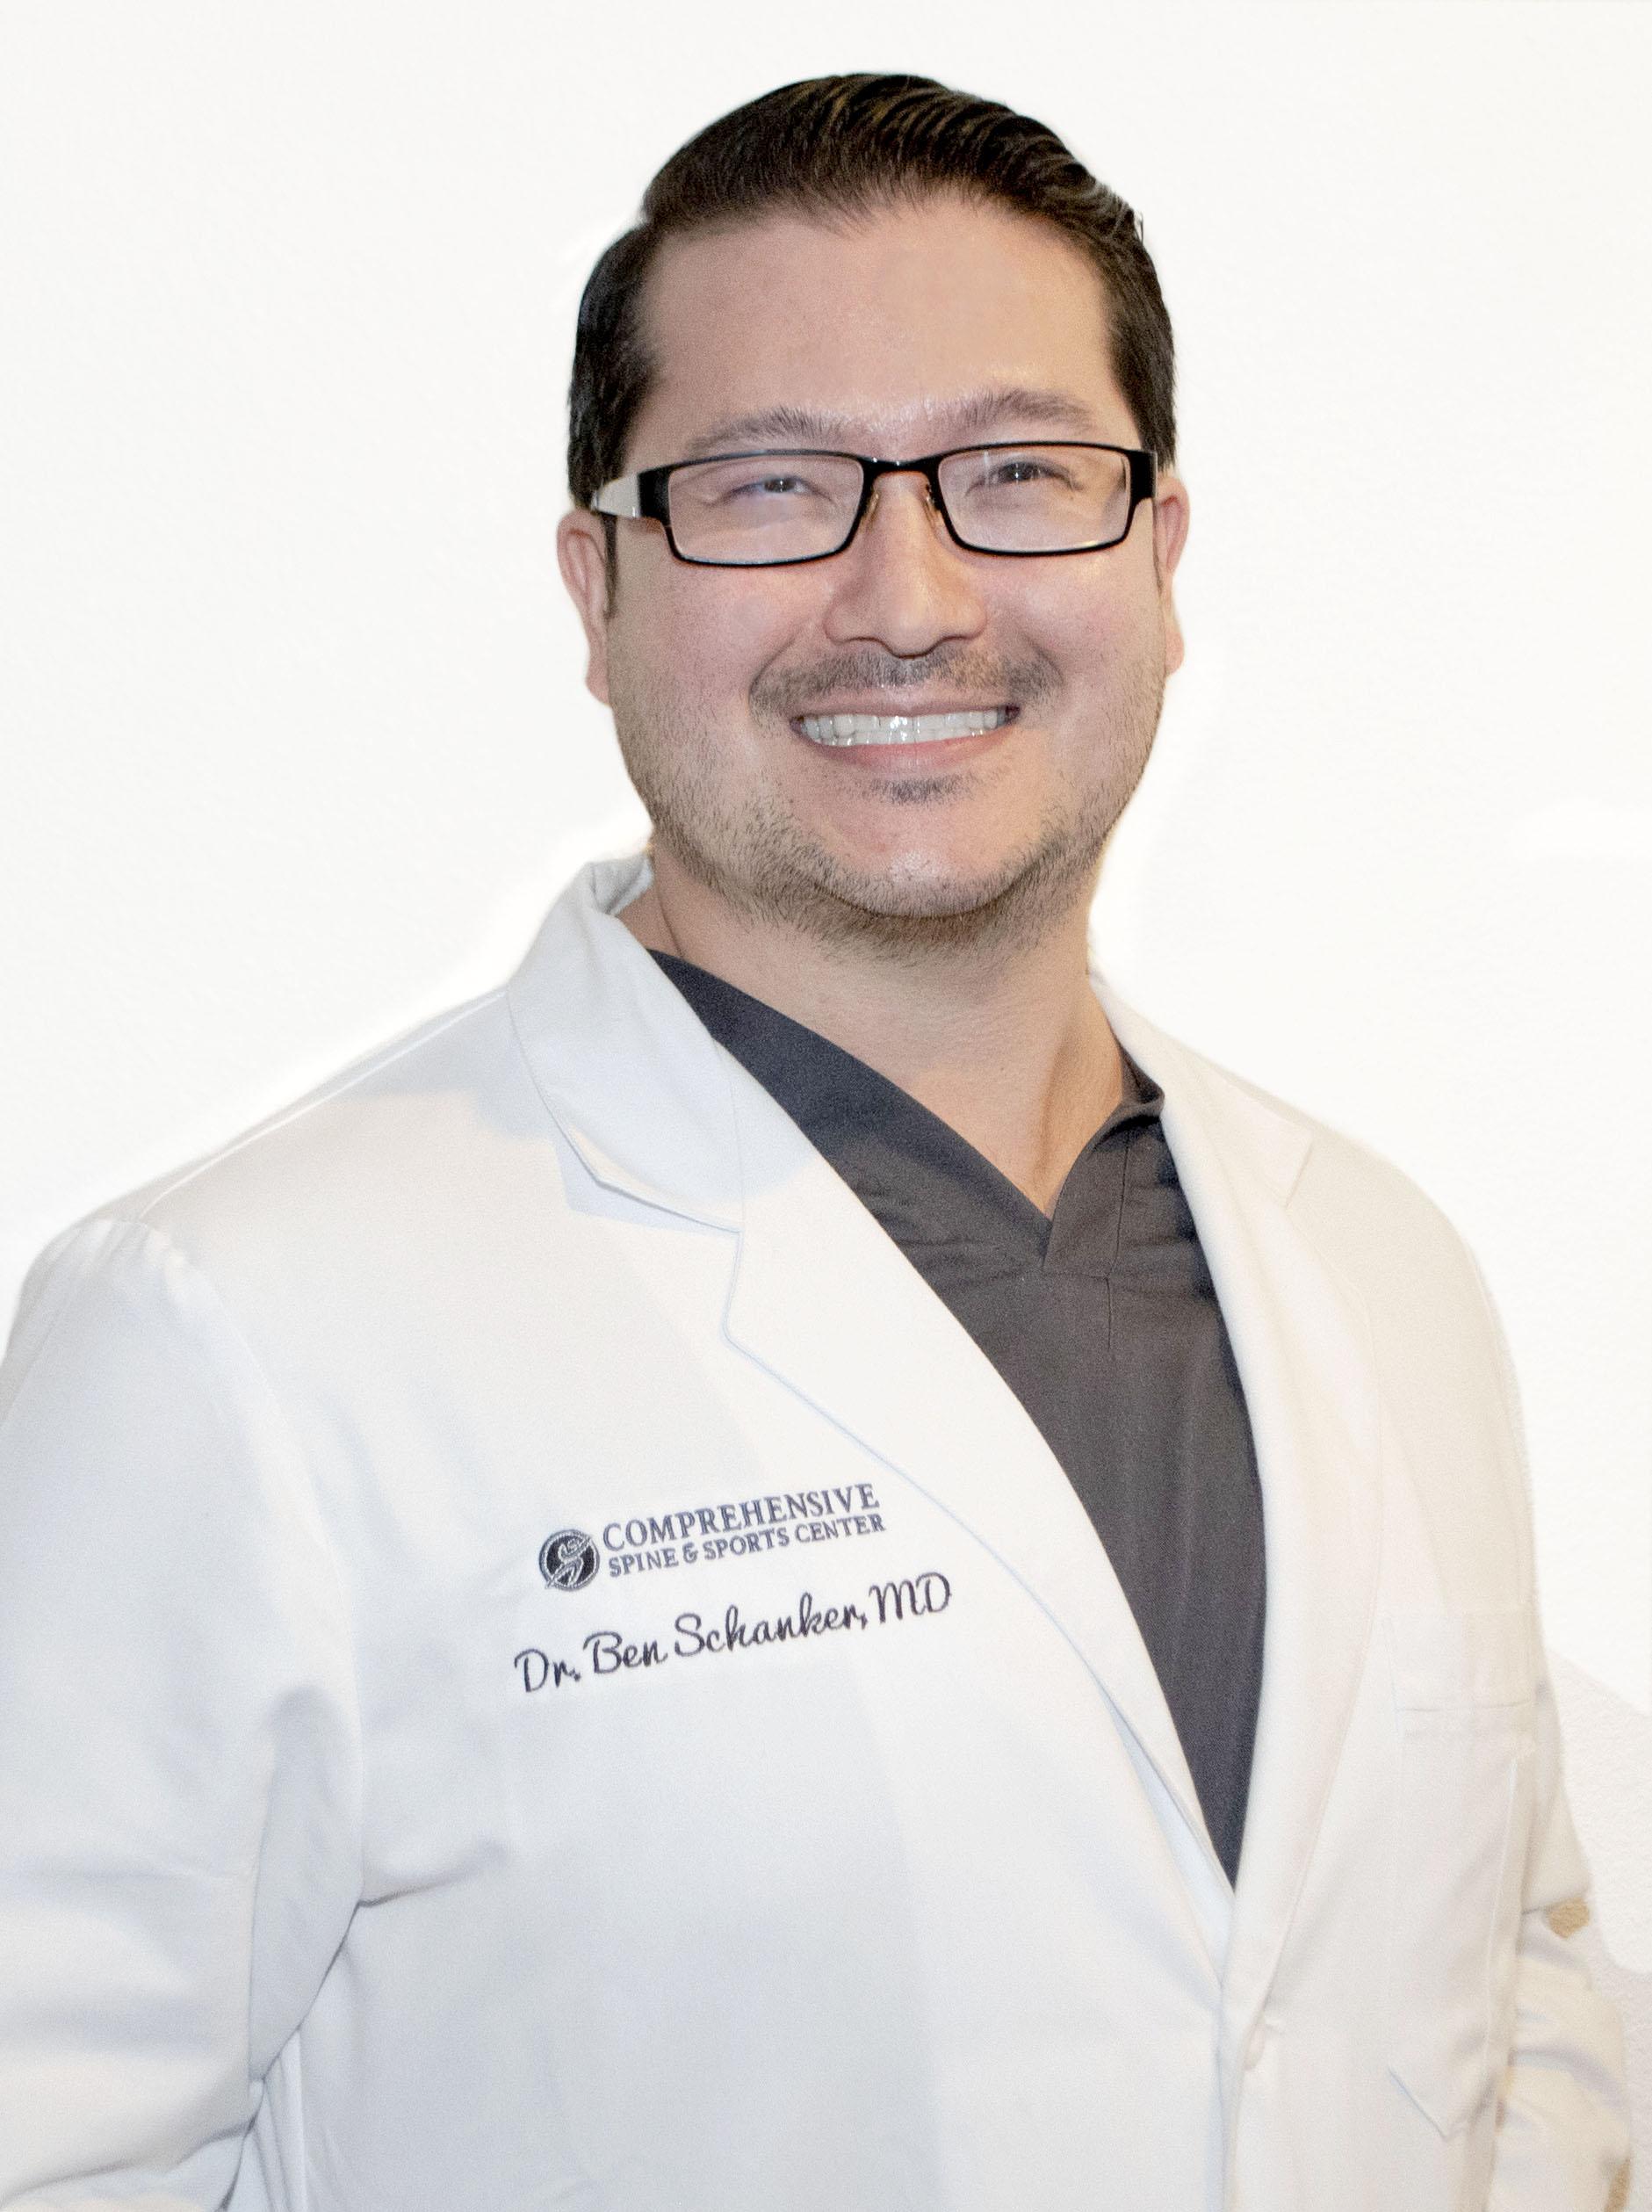 Dr. Schanker